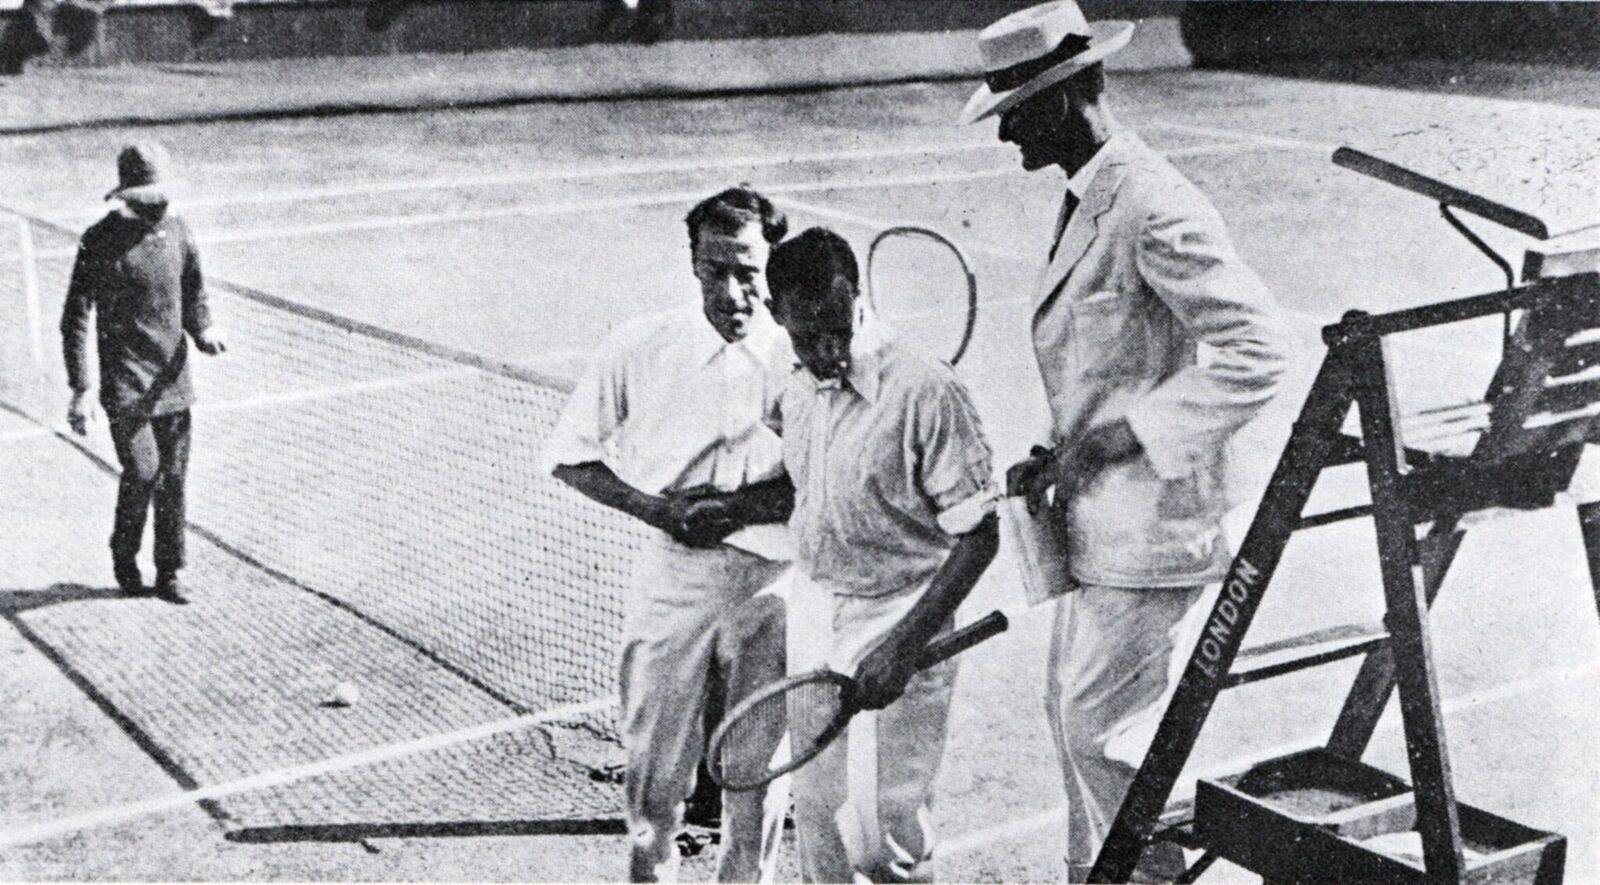 Tennis Membership